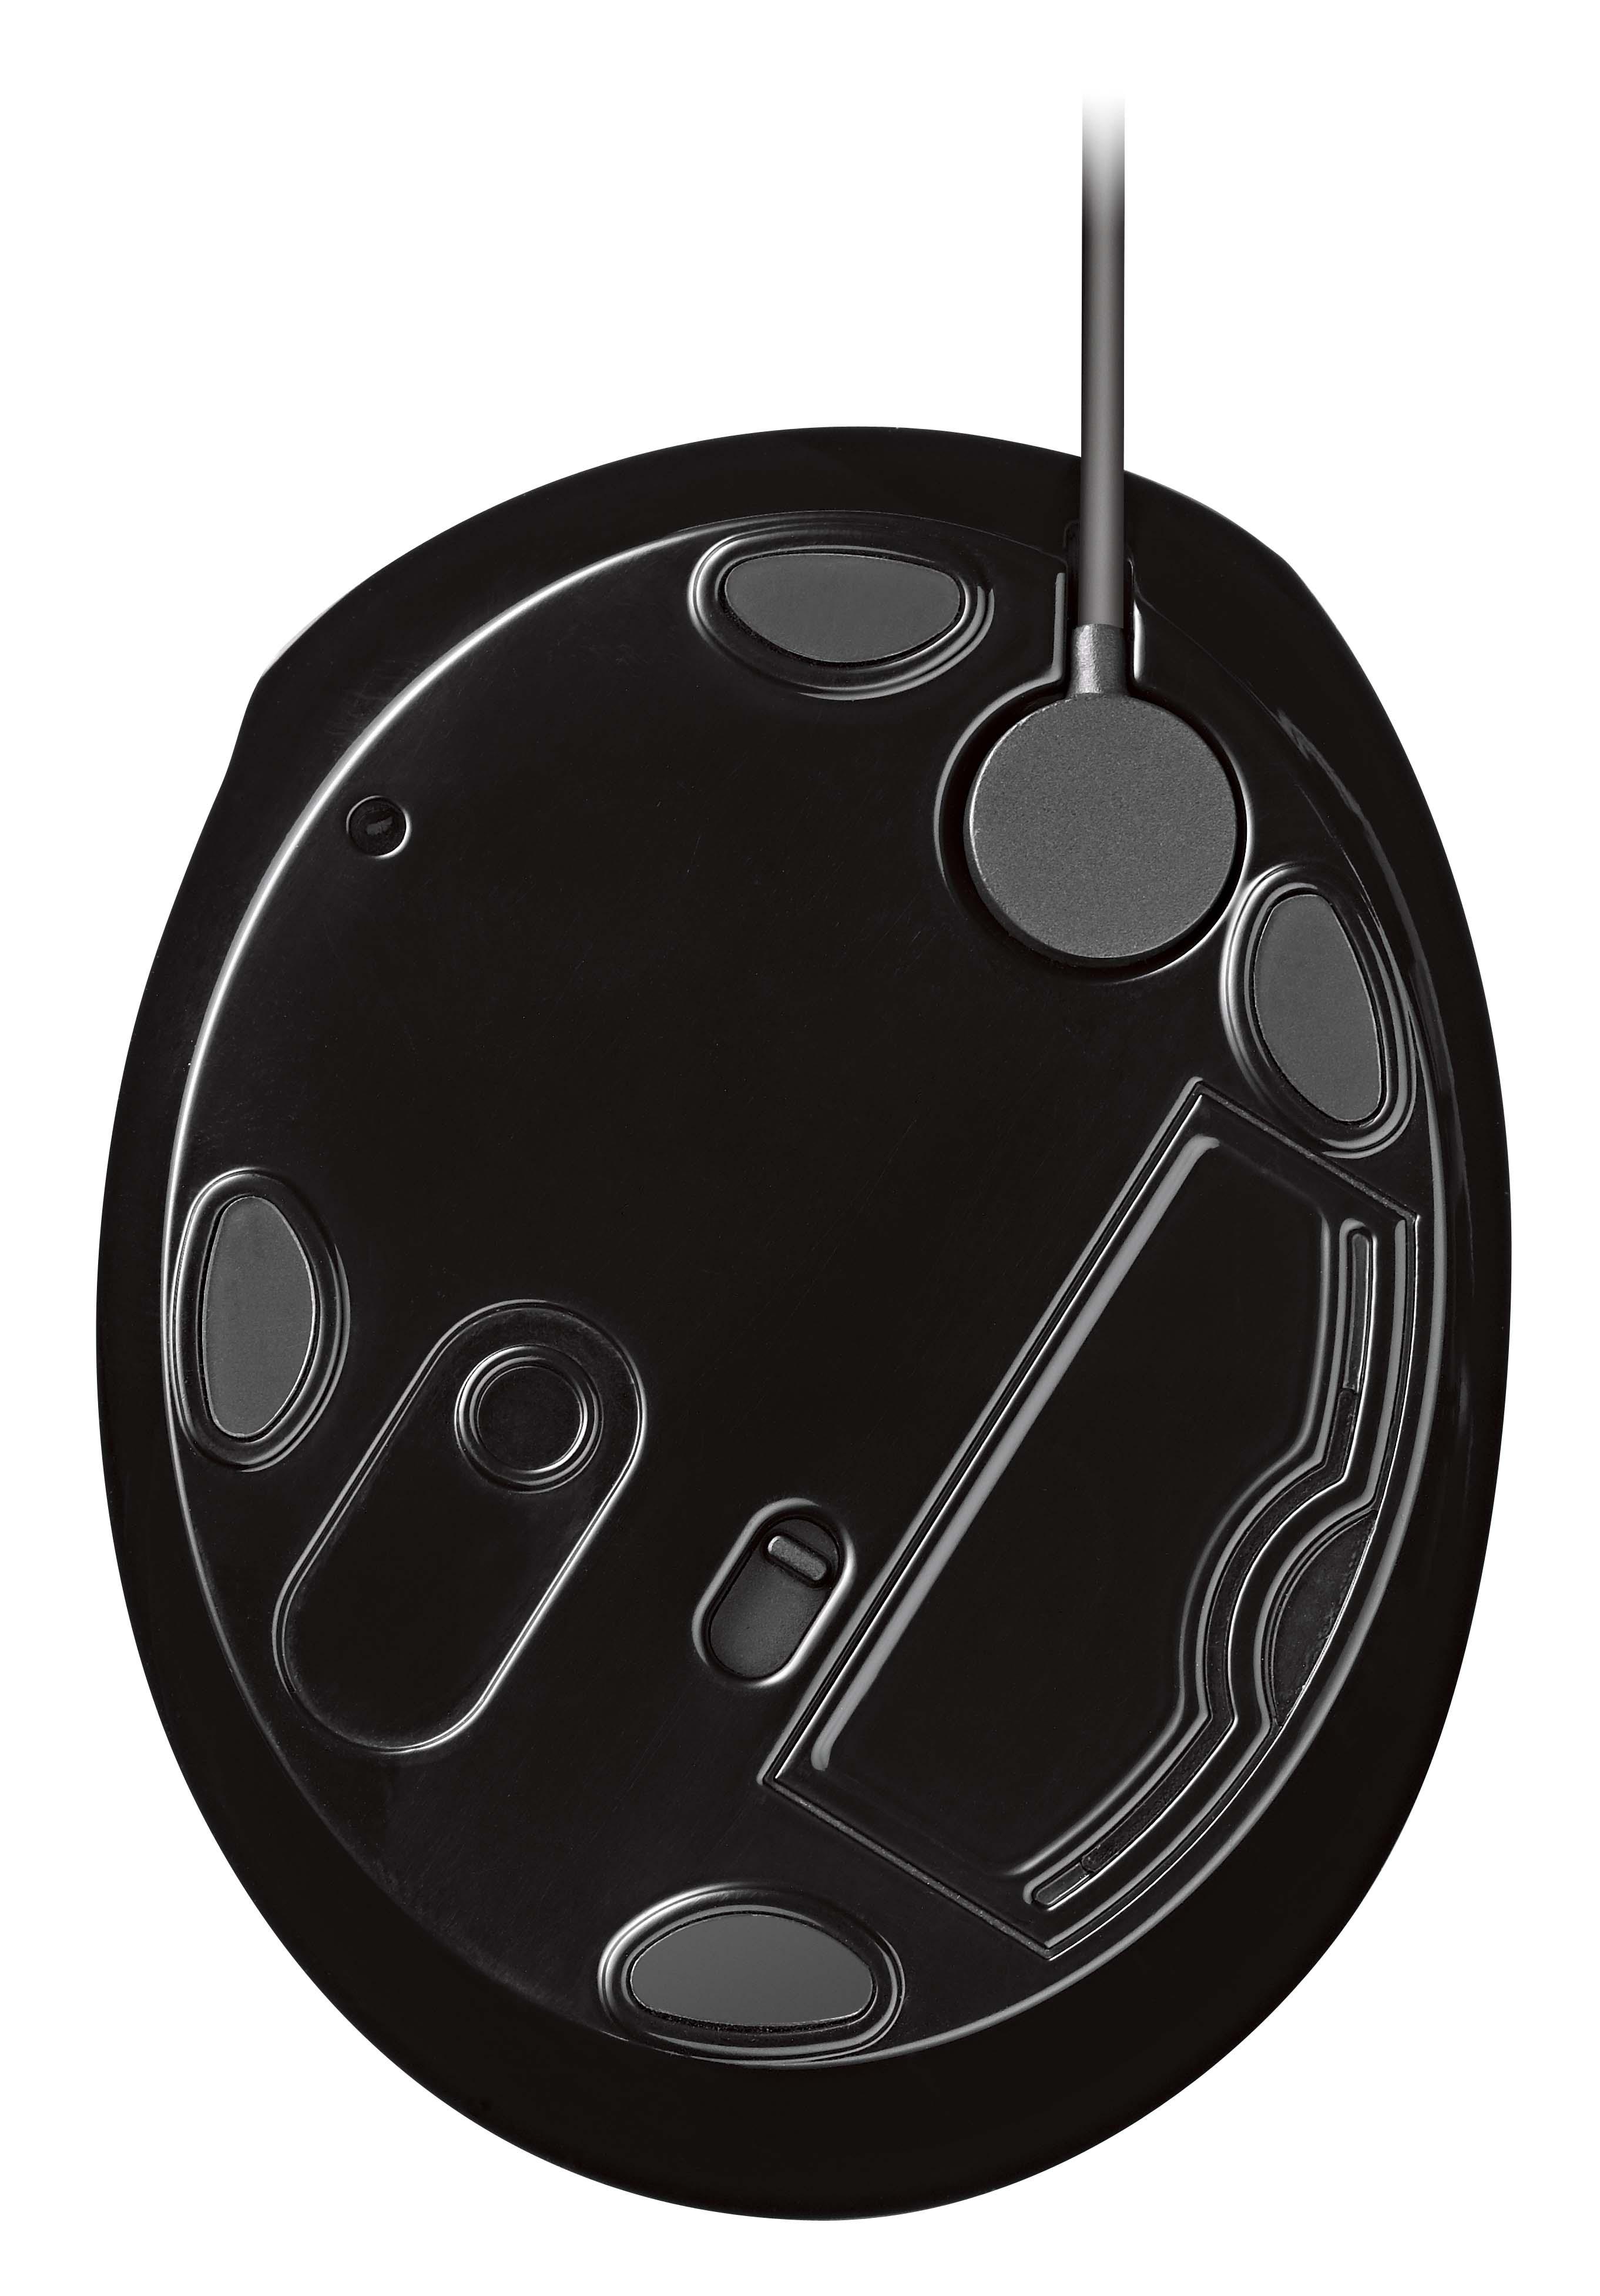 Mobile Memory Mouse Bottom